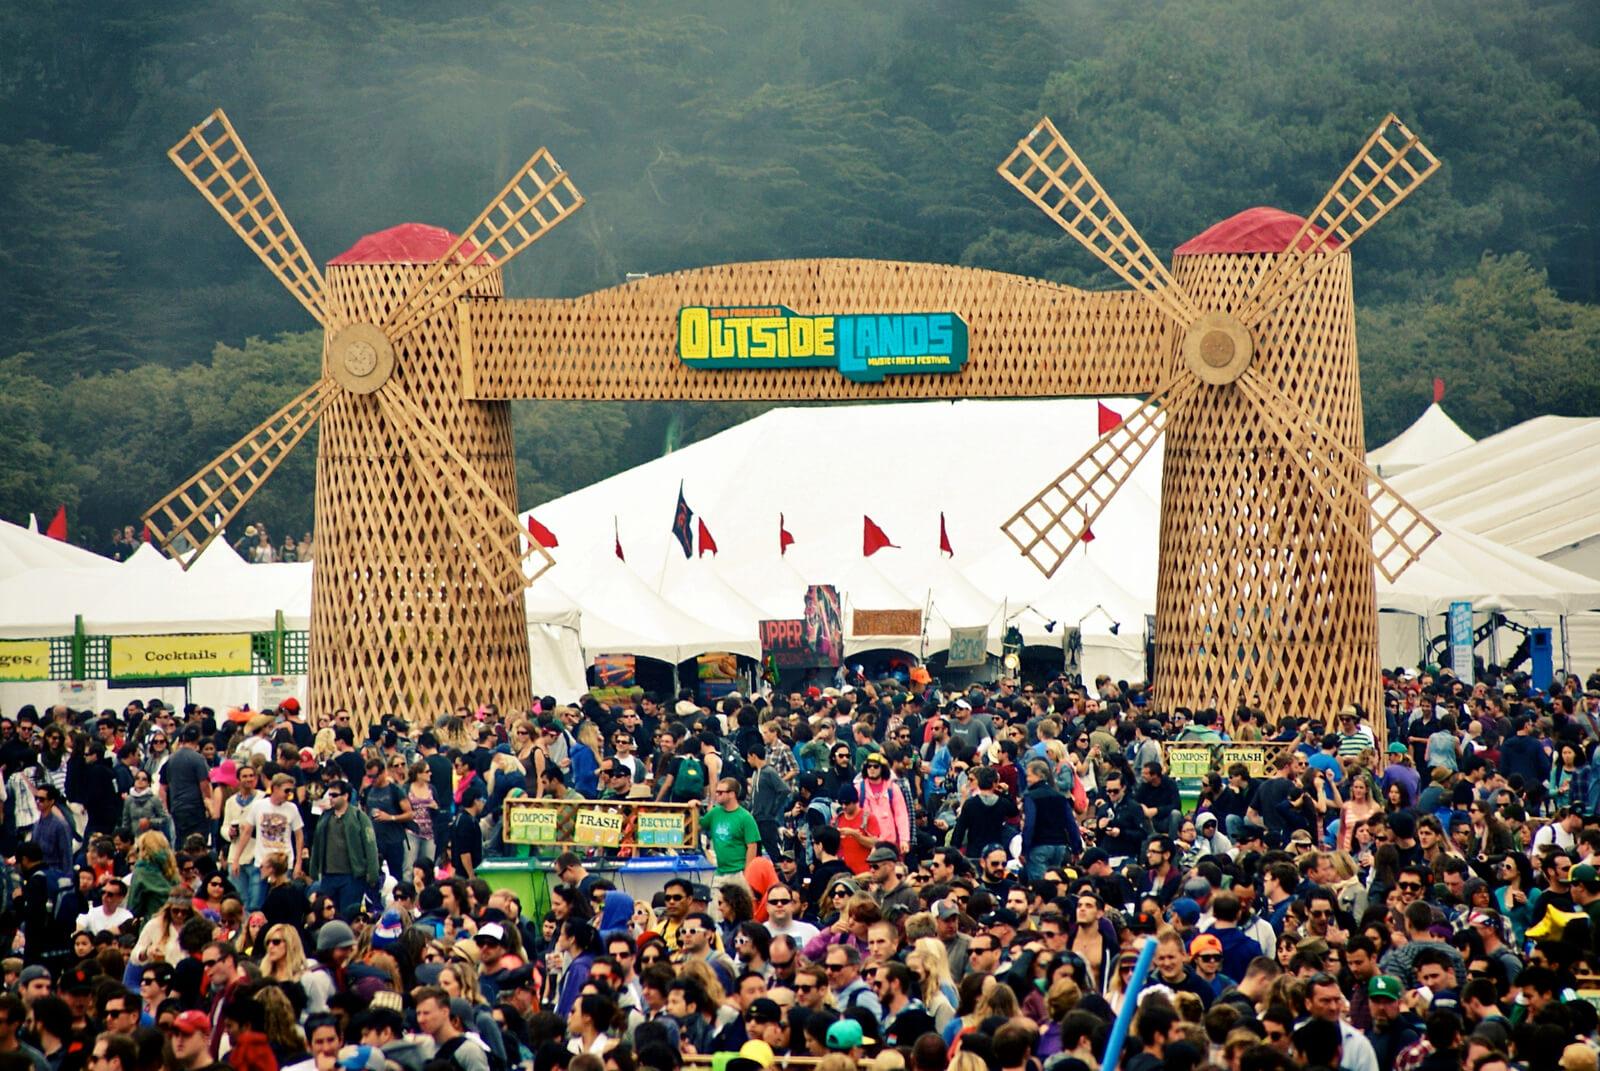 Outside Lands Festival scultpure